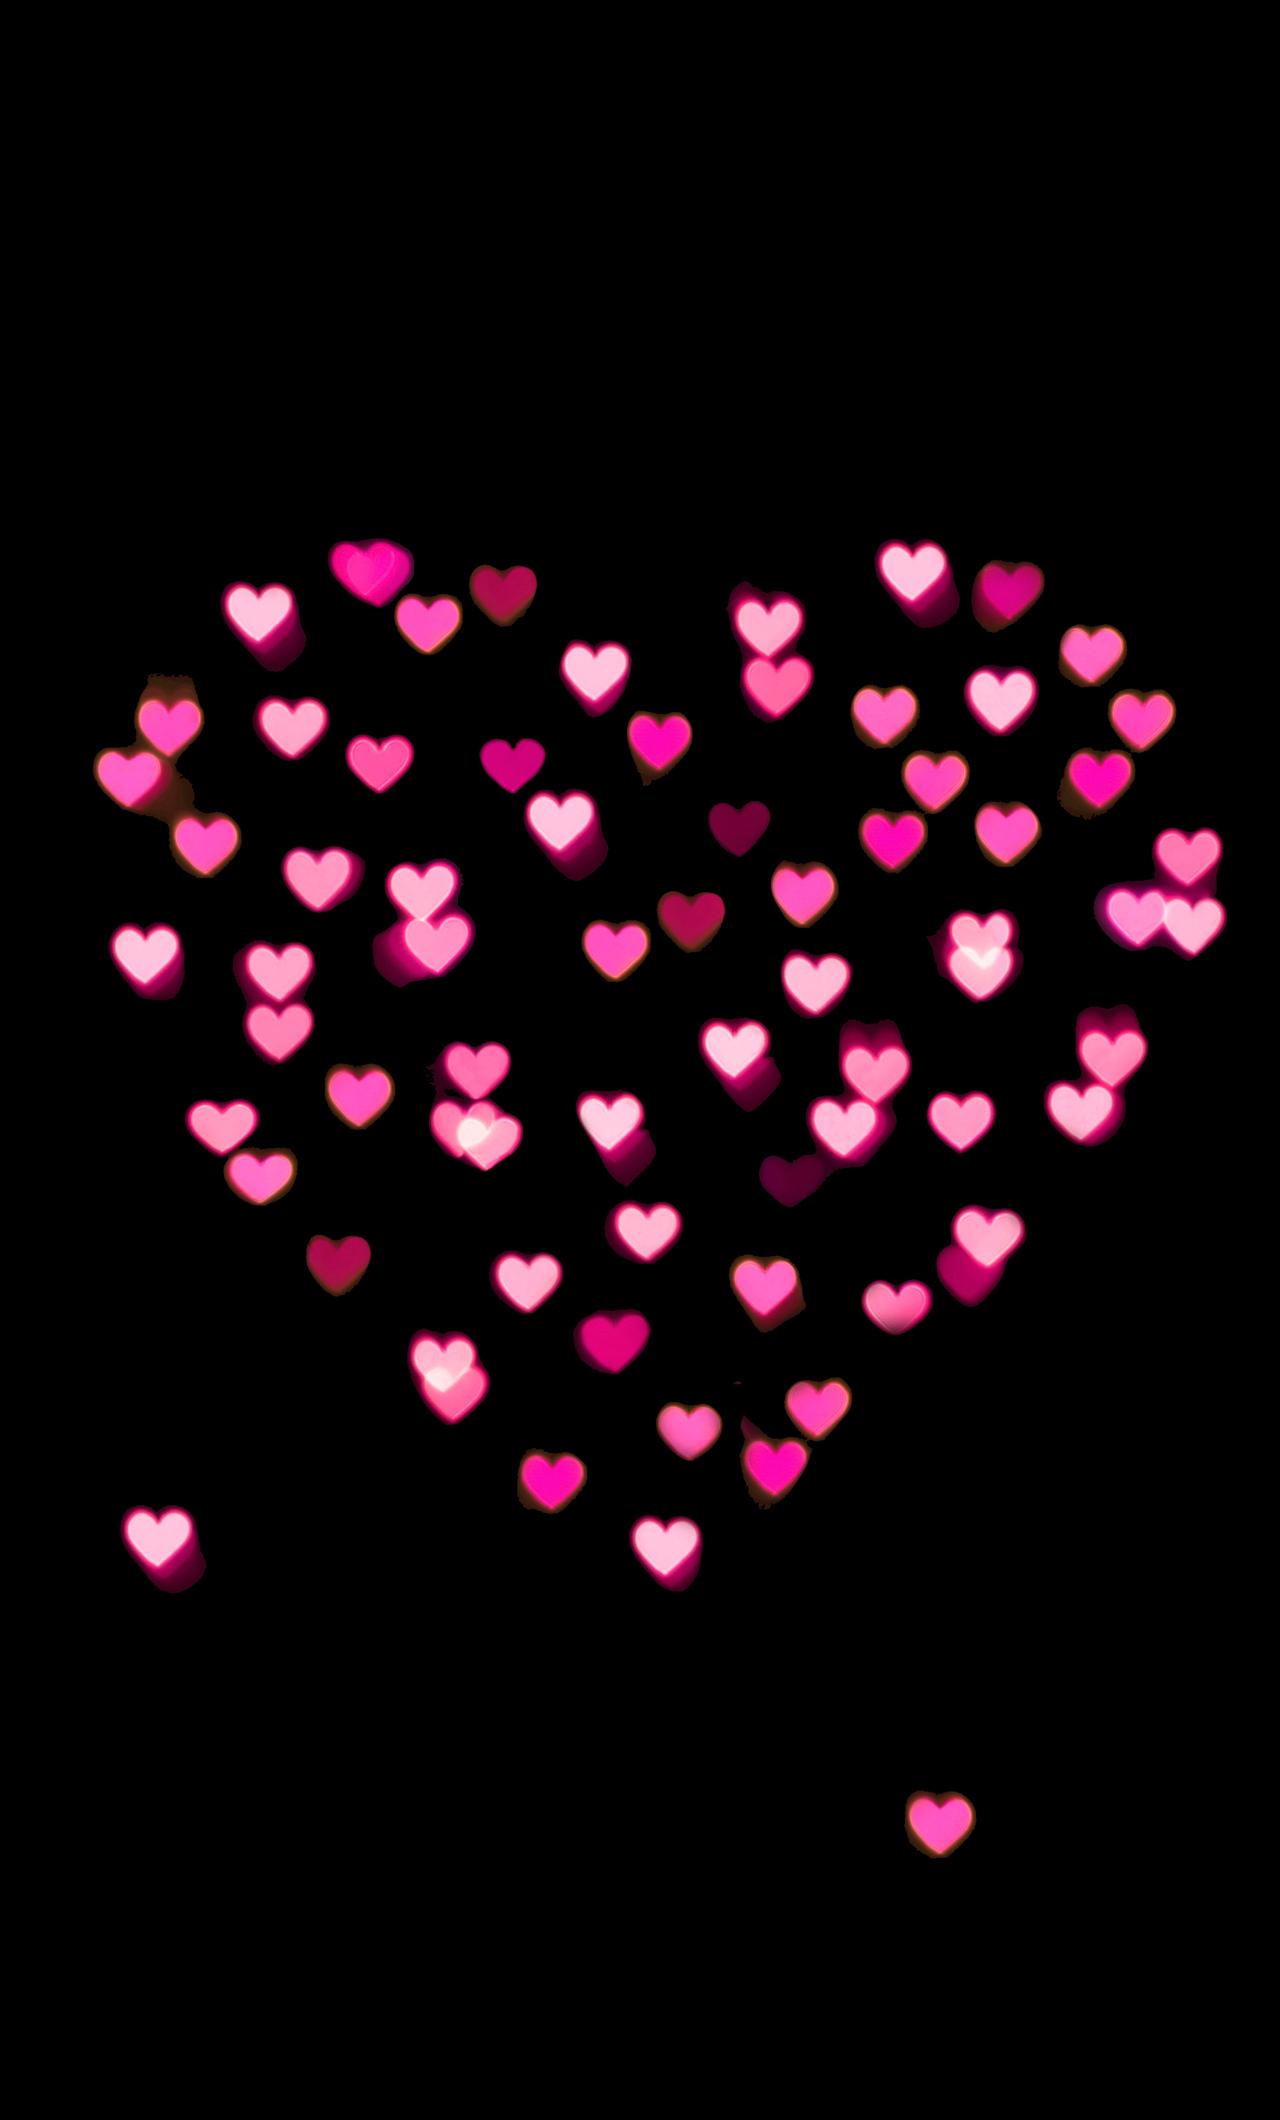 heart-valentine-5k-p6.jpg